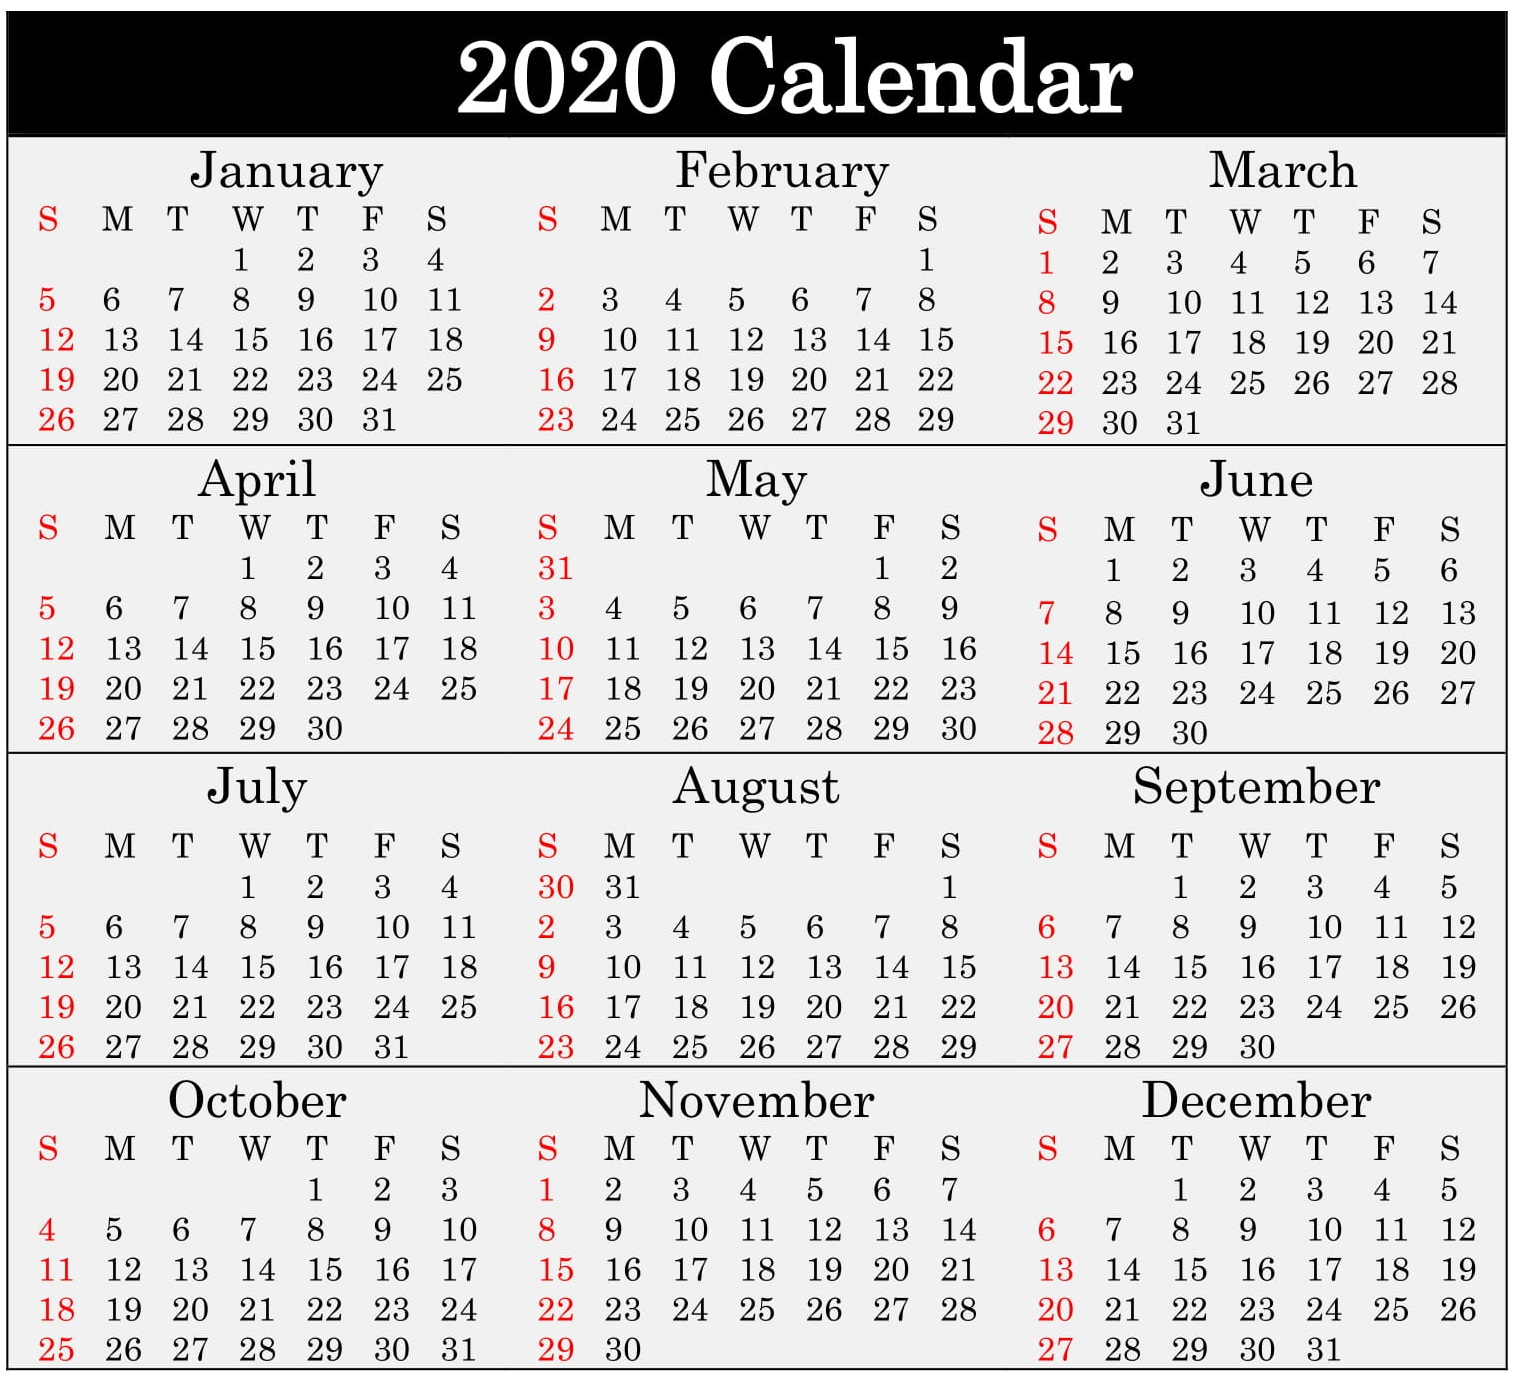 Printable 2020 Calendar Word Document  Latest Printable inside Julian Leap Year Calendar